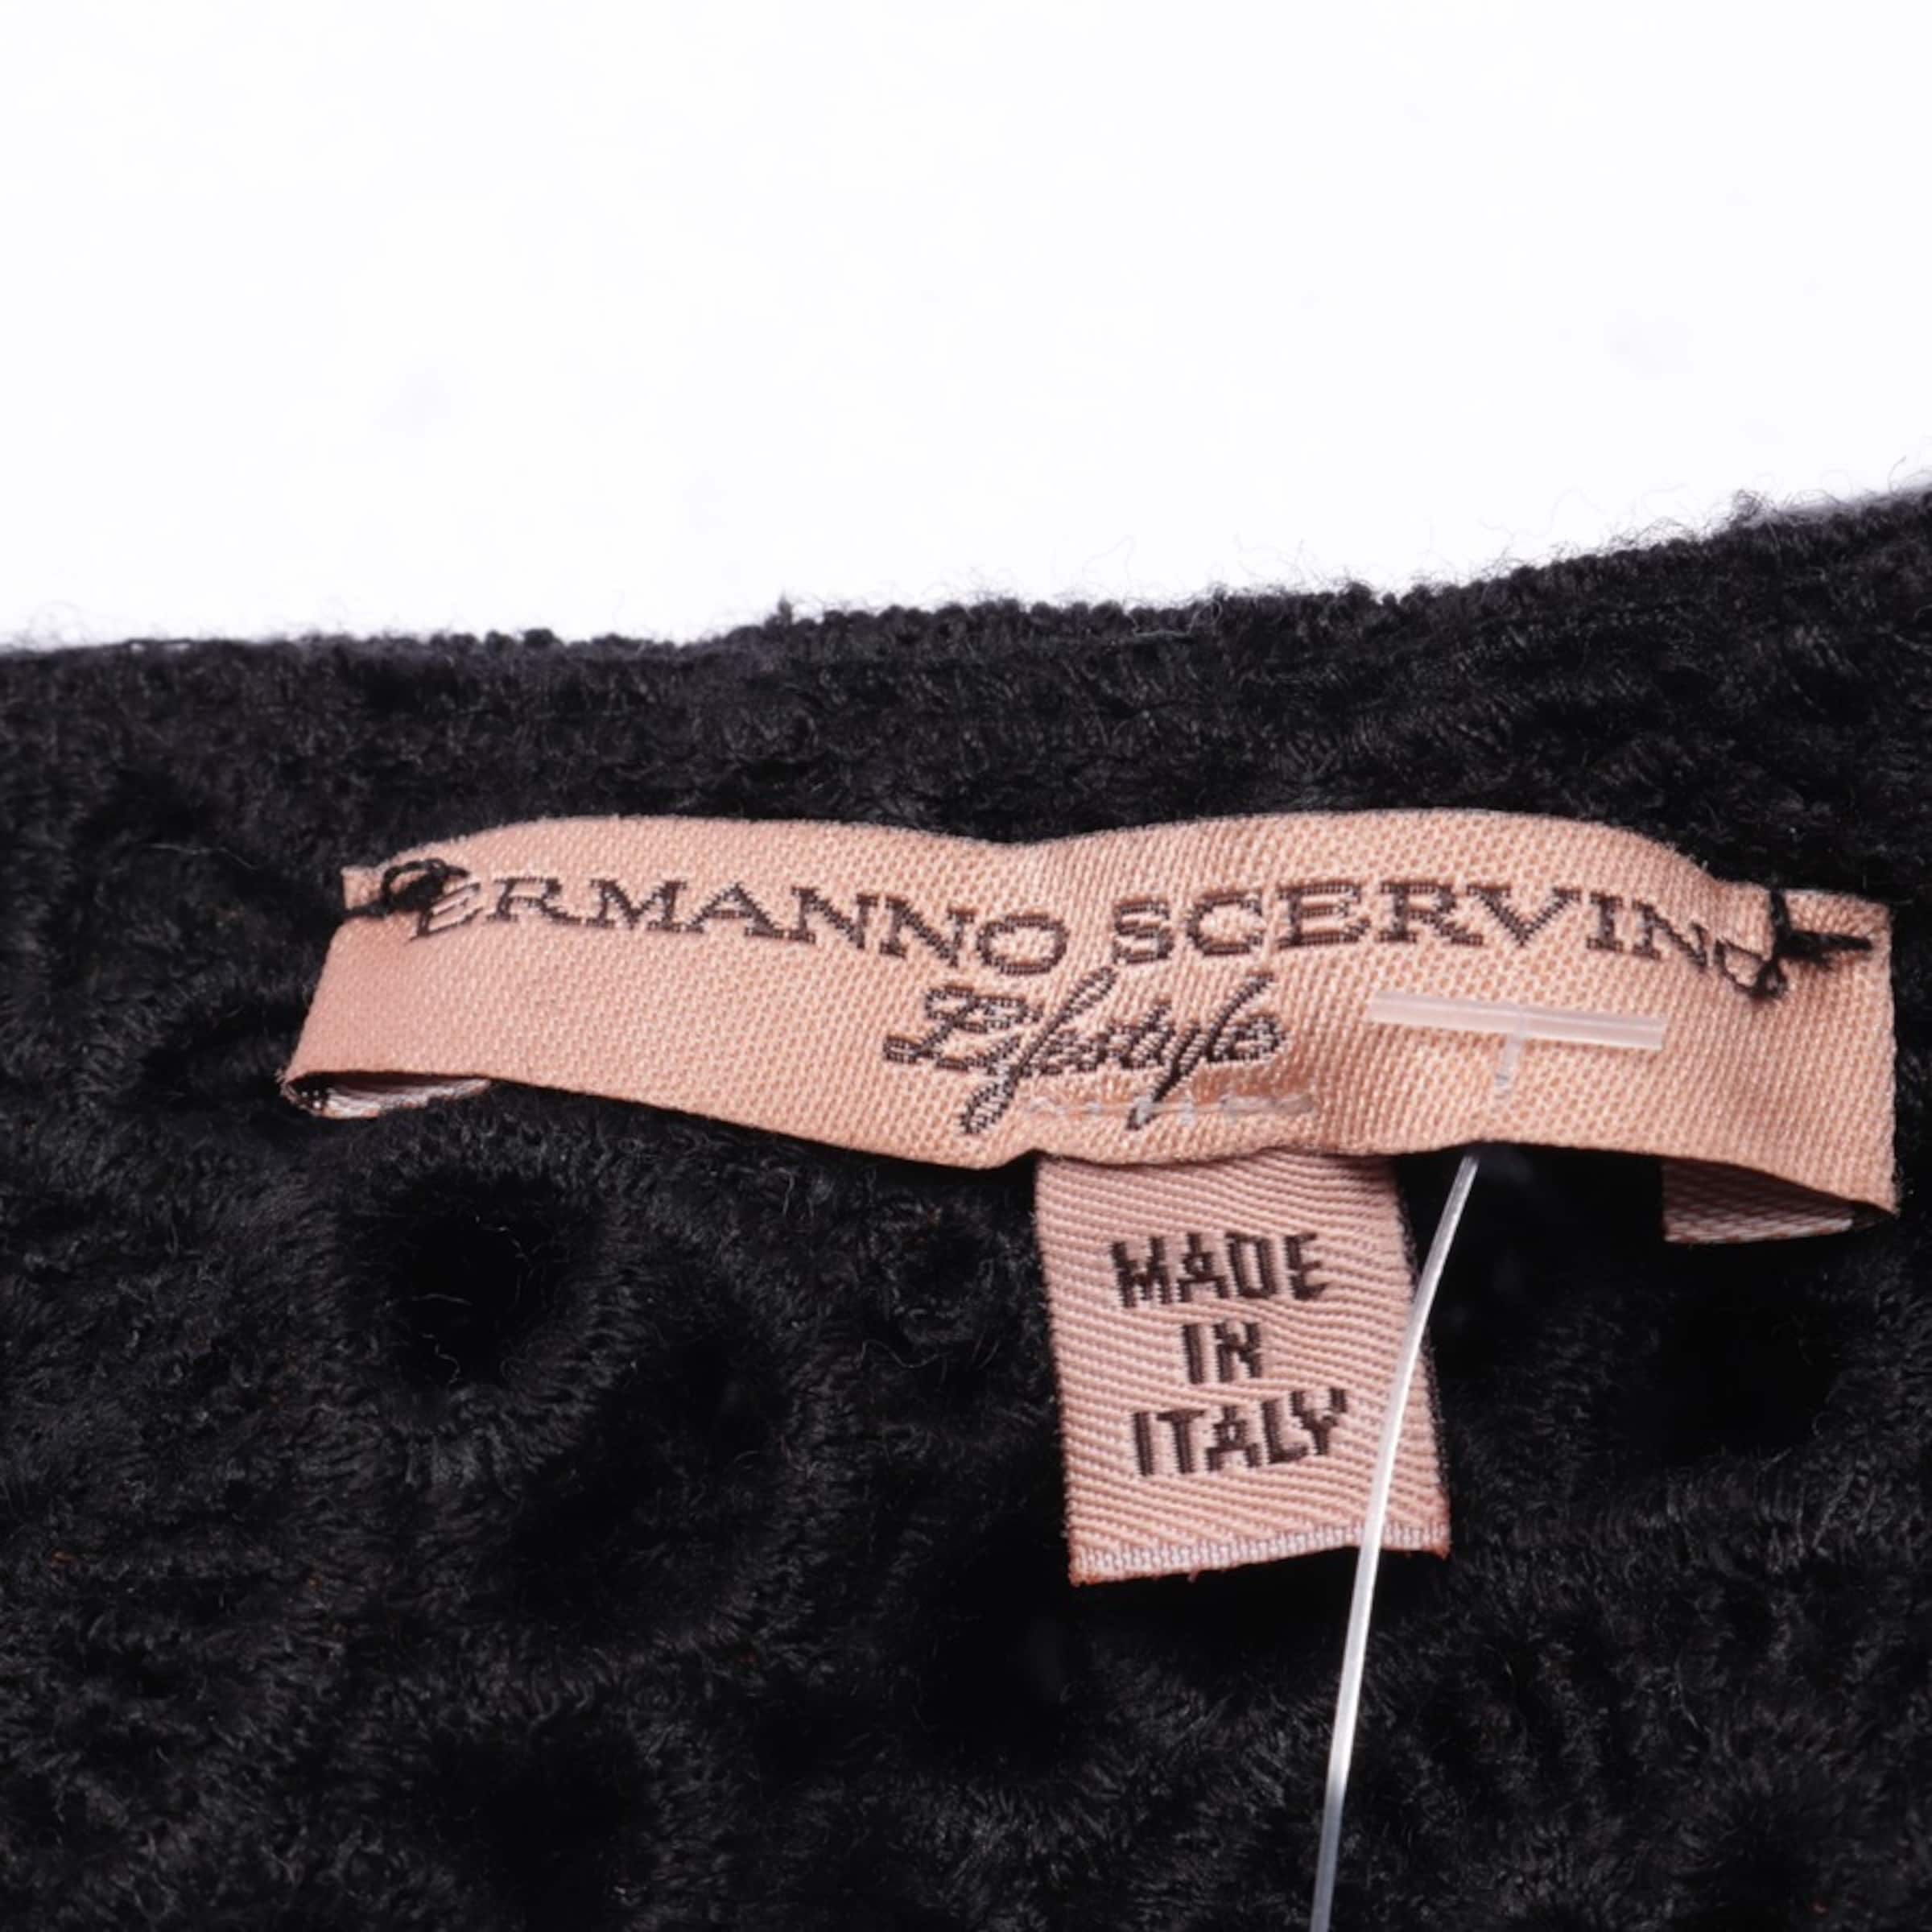 Ermanno Scervino Strickkleid in 36 in schwarz